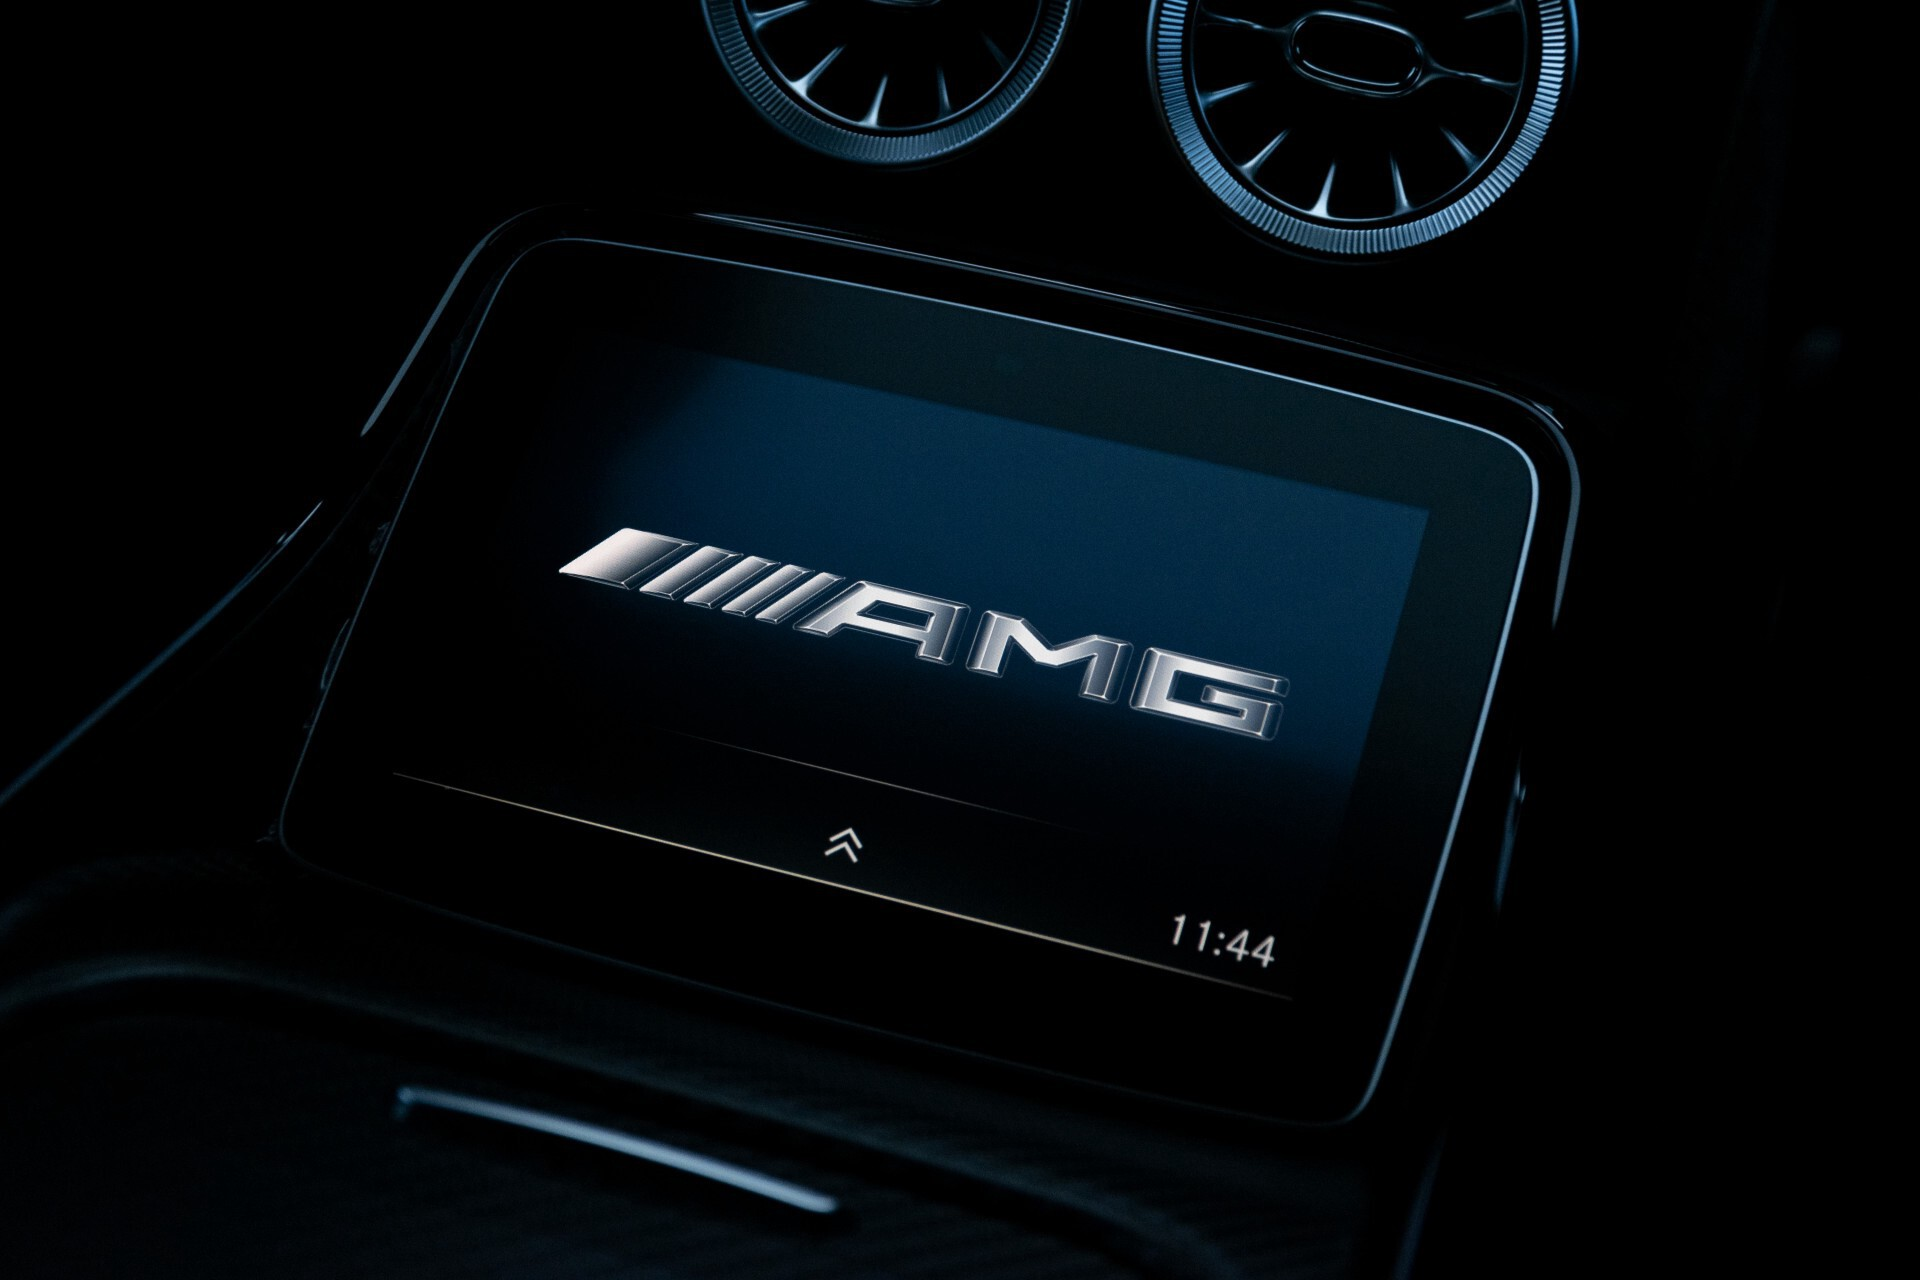 Mercedes-Benz AMG GT 4-Door Coupe 63 S 4MATIC+ Edition 1 Keramisch/Carbon/First Class/Dynamic Plus/Burmester High End 3D Aut9 Foto 72